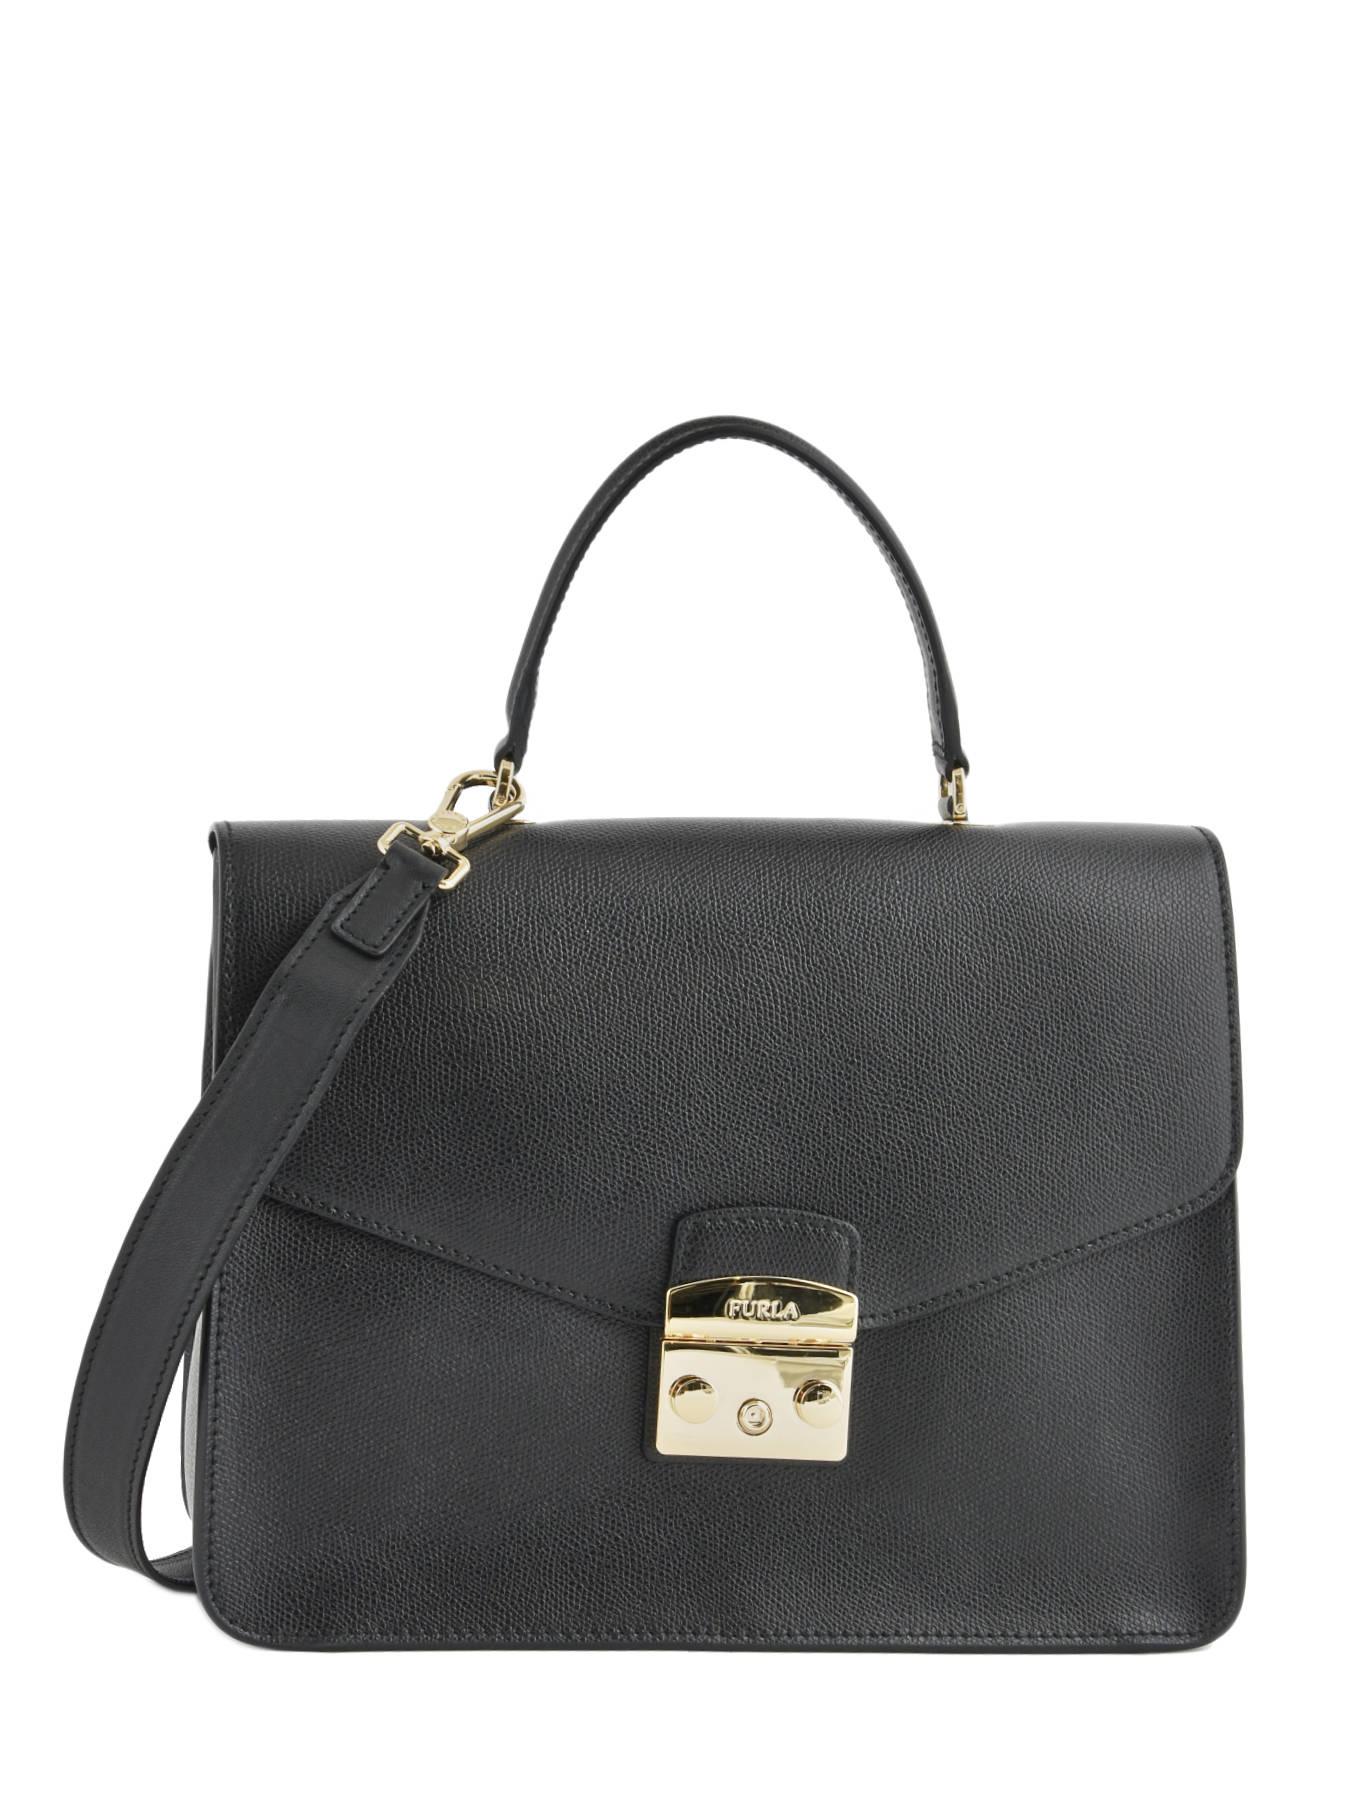 aae275111d36 ... Top Handle L Metropolis Leather Furla Black metropolis EP0-BOO9 ...